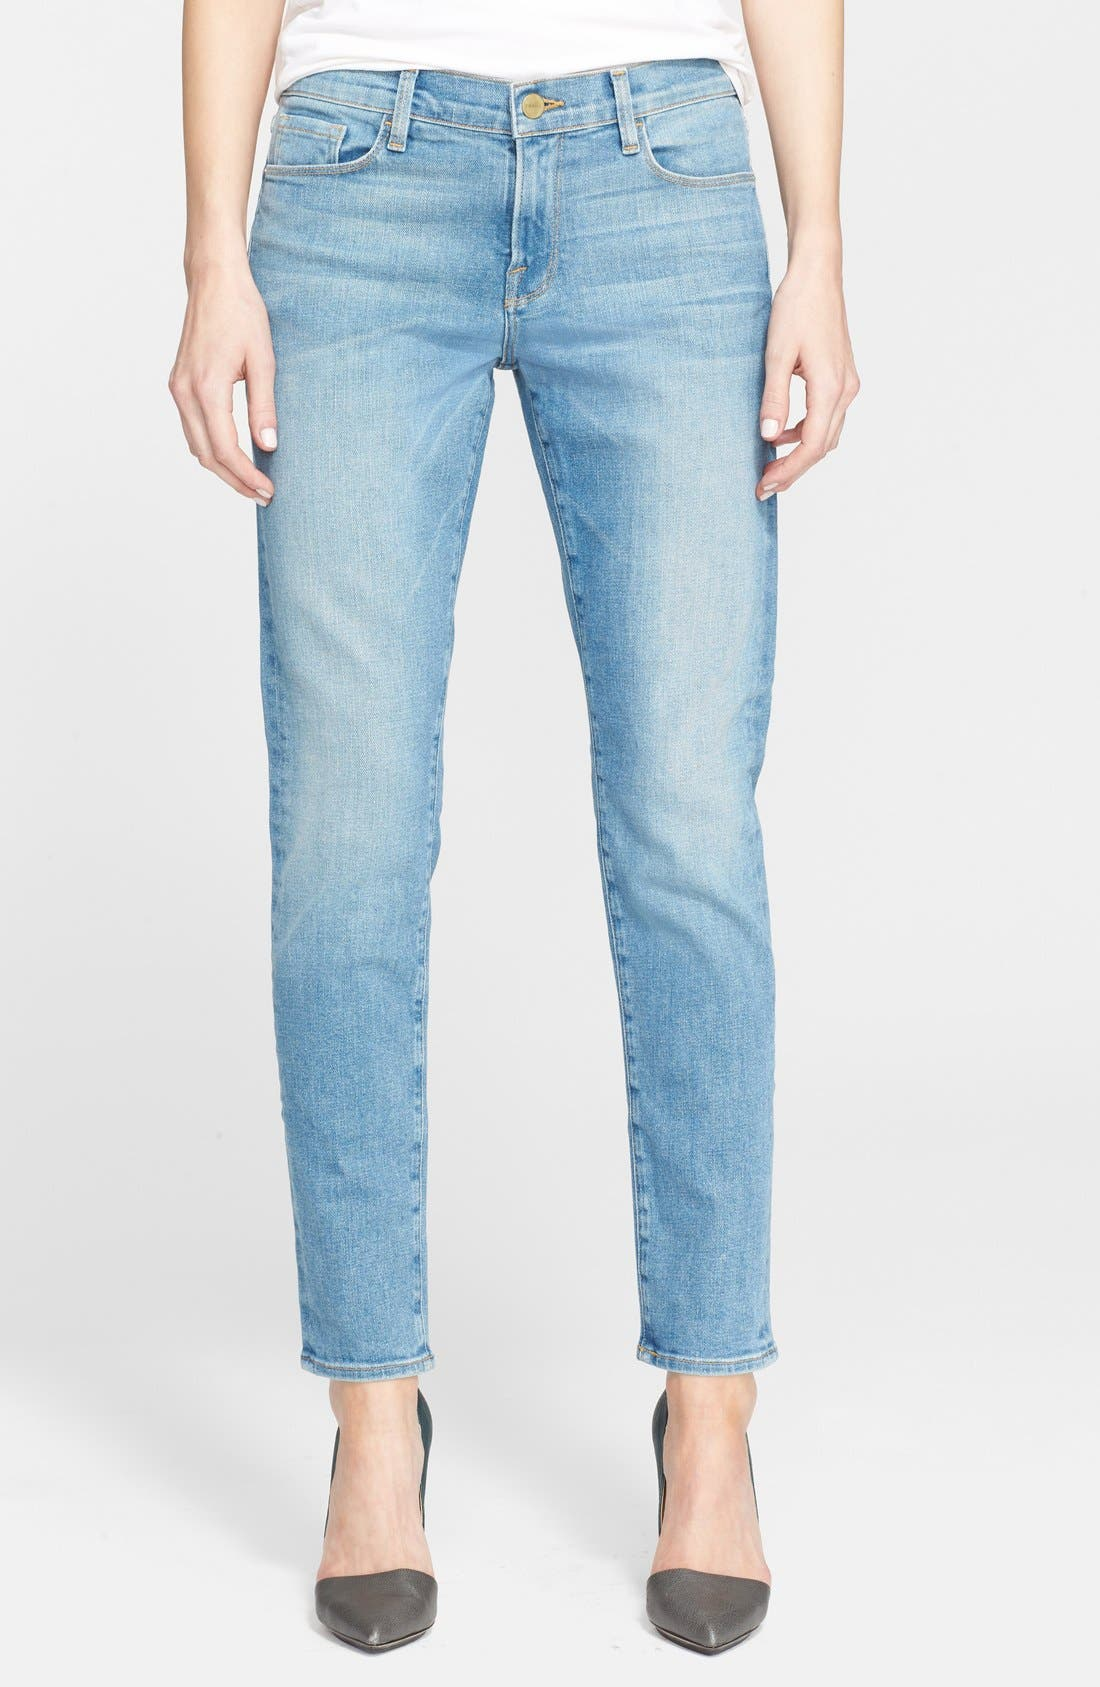 Alternate Image 1 Selected - Frame Denim 'Le Garcon' Boyfriend Jeans (Exmouth)